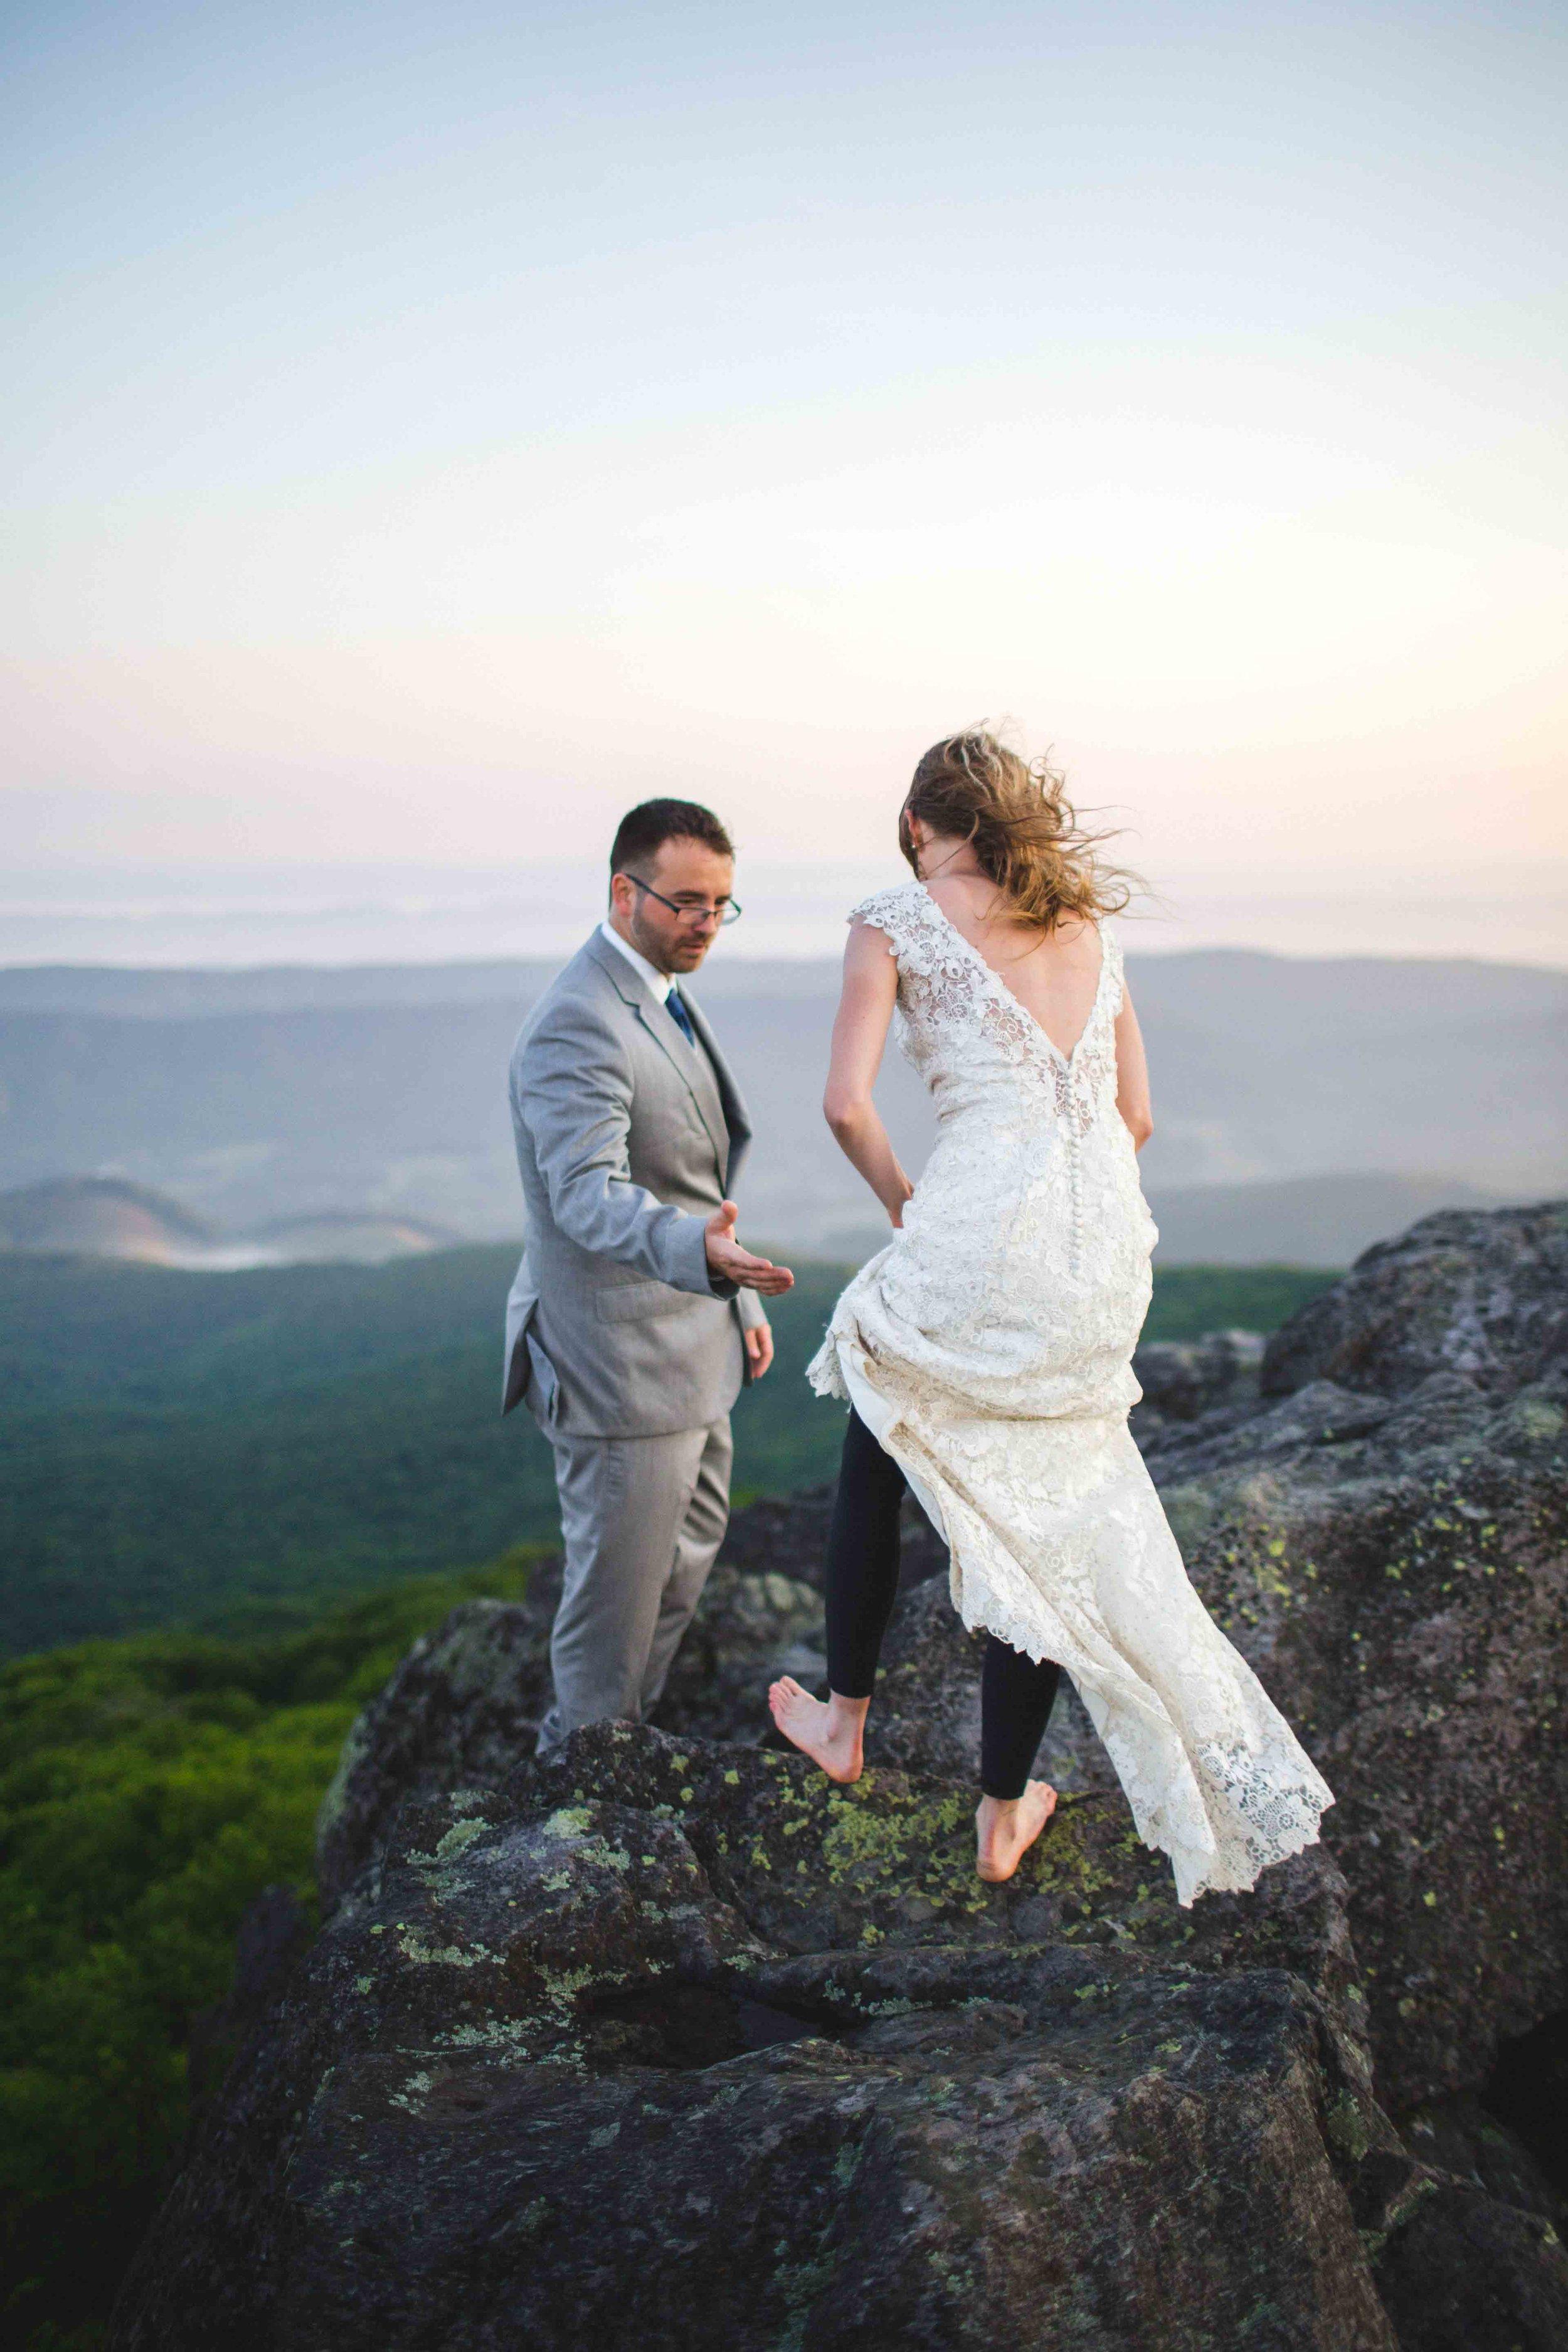 north-carolina-elopement-photographer-50.jpg